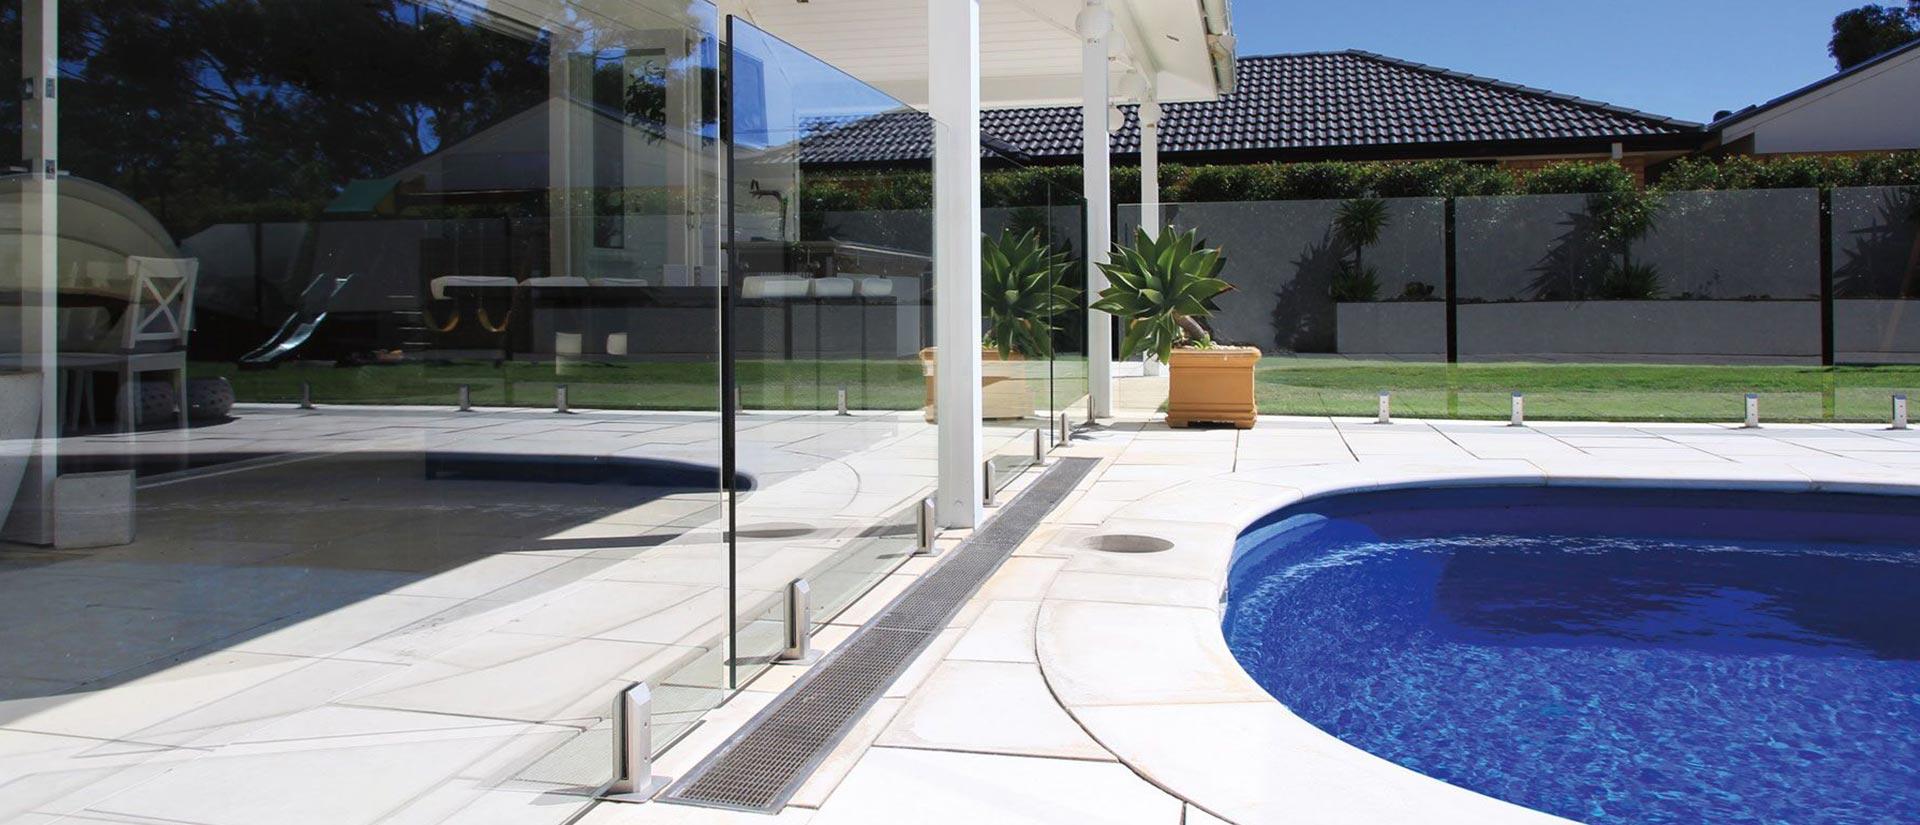 swimming pool glass fencing birmingham ltd birmingham. Black Bedroom Furniture Sets. Home Design Ideas